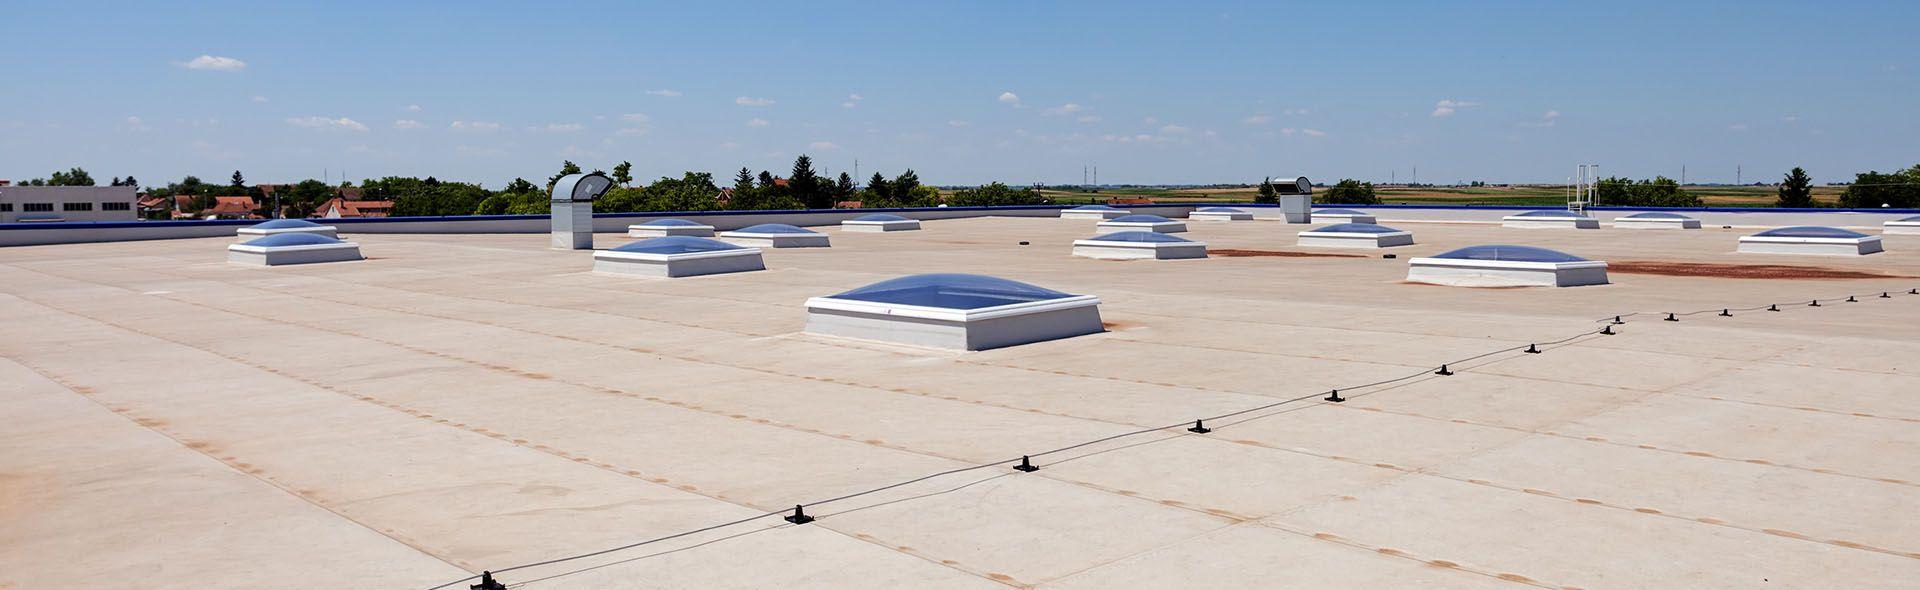 Warranties Srg Roofing Flat Roof Roofing Contractors Flat Roof Maintenance